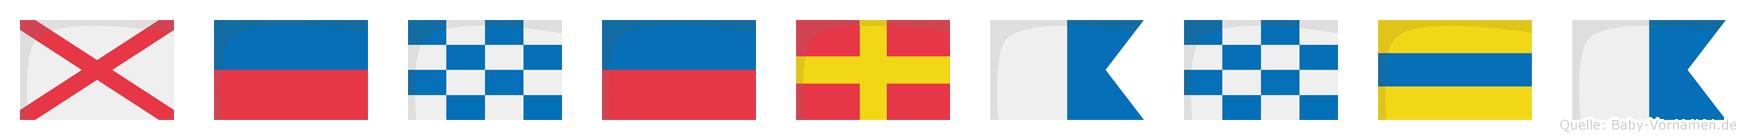 Veneranda im Flaggenalphabet